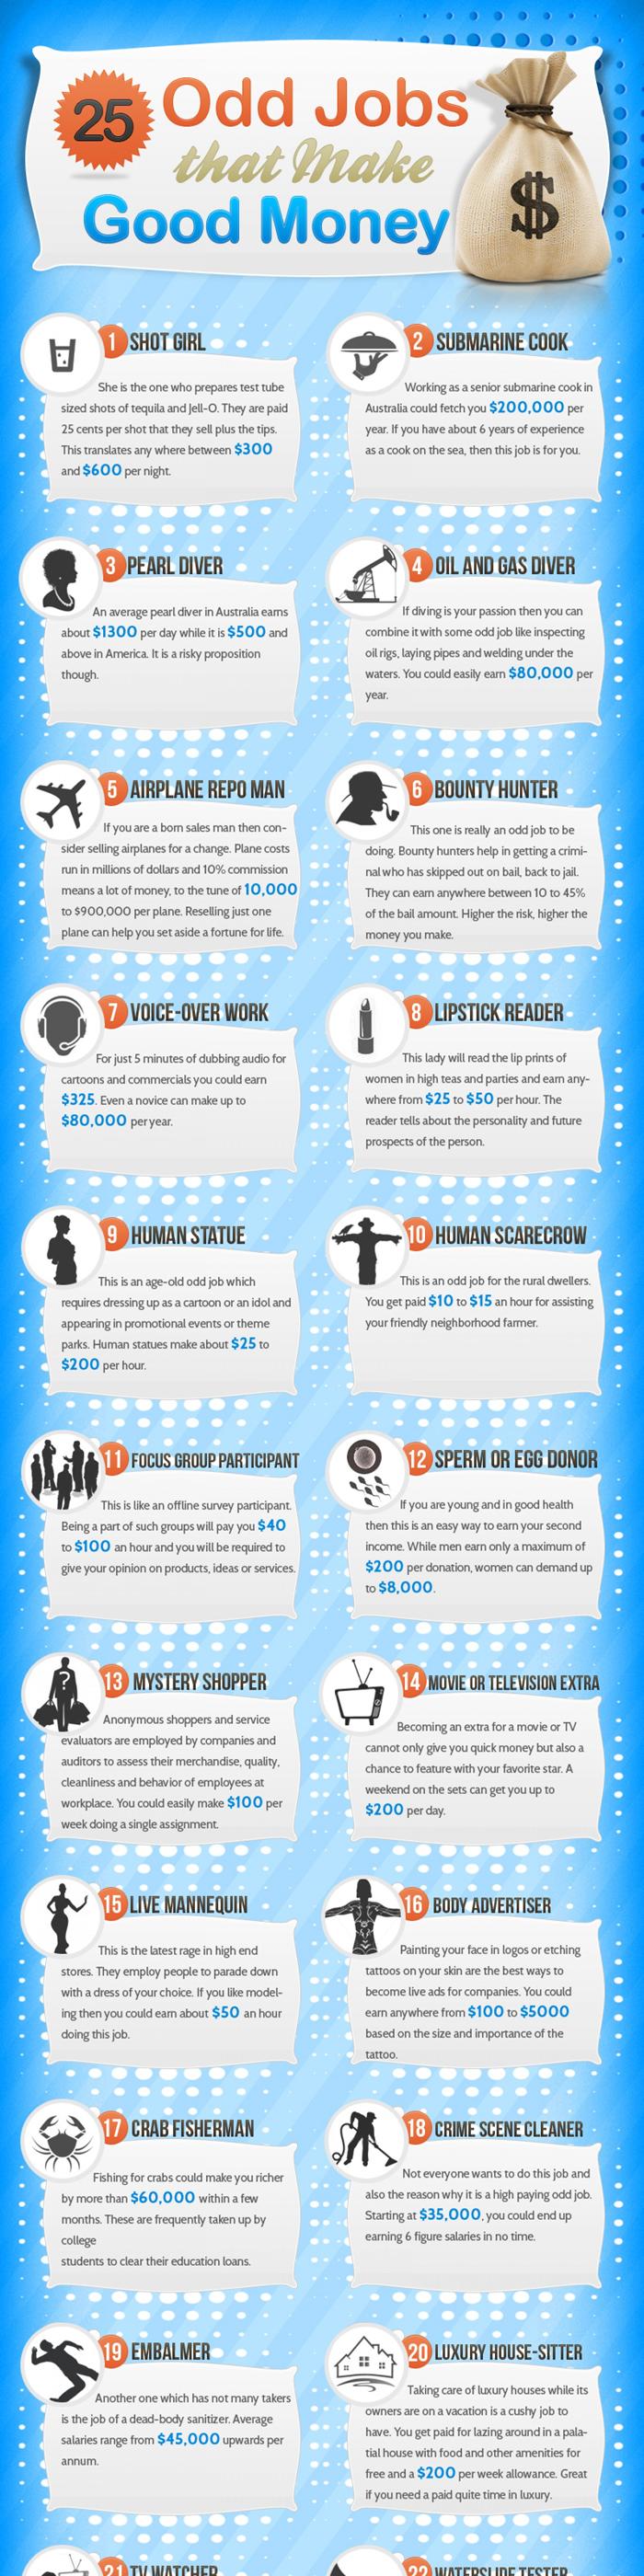 25 Odd Jobs that Make Good Money   www.TheHeavyPurse.com